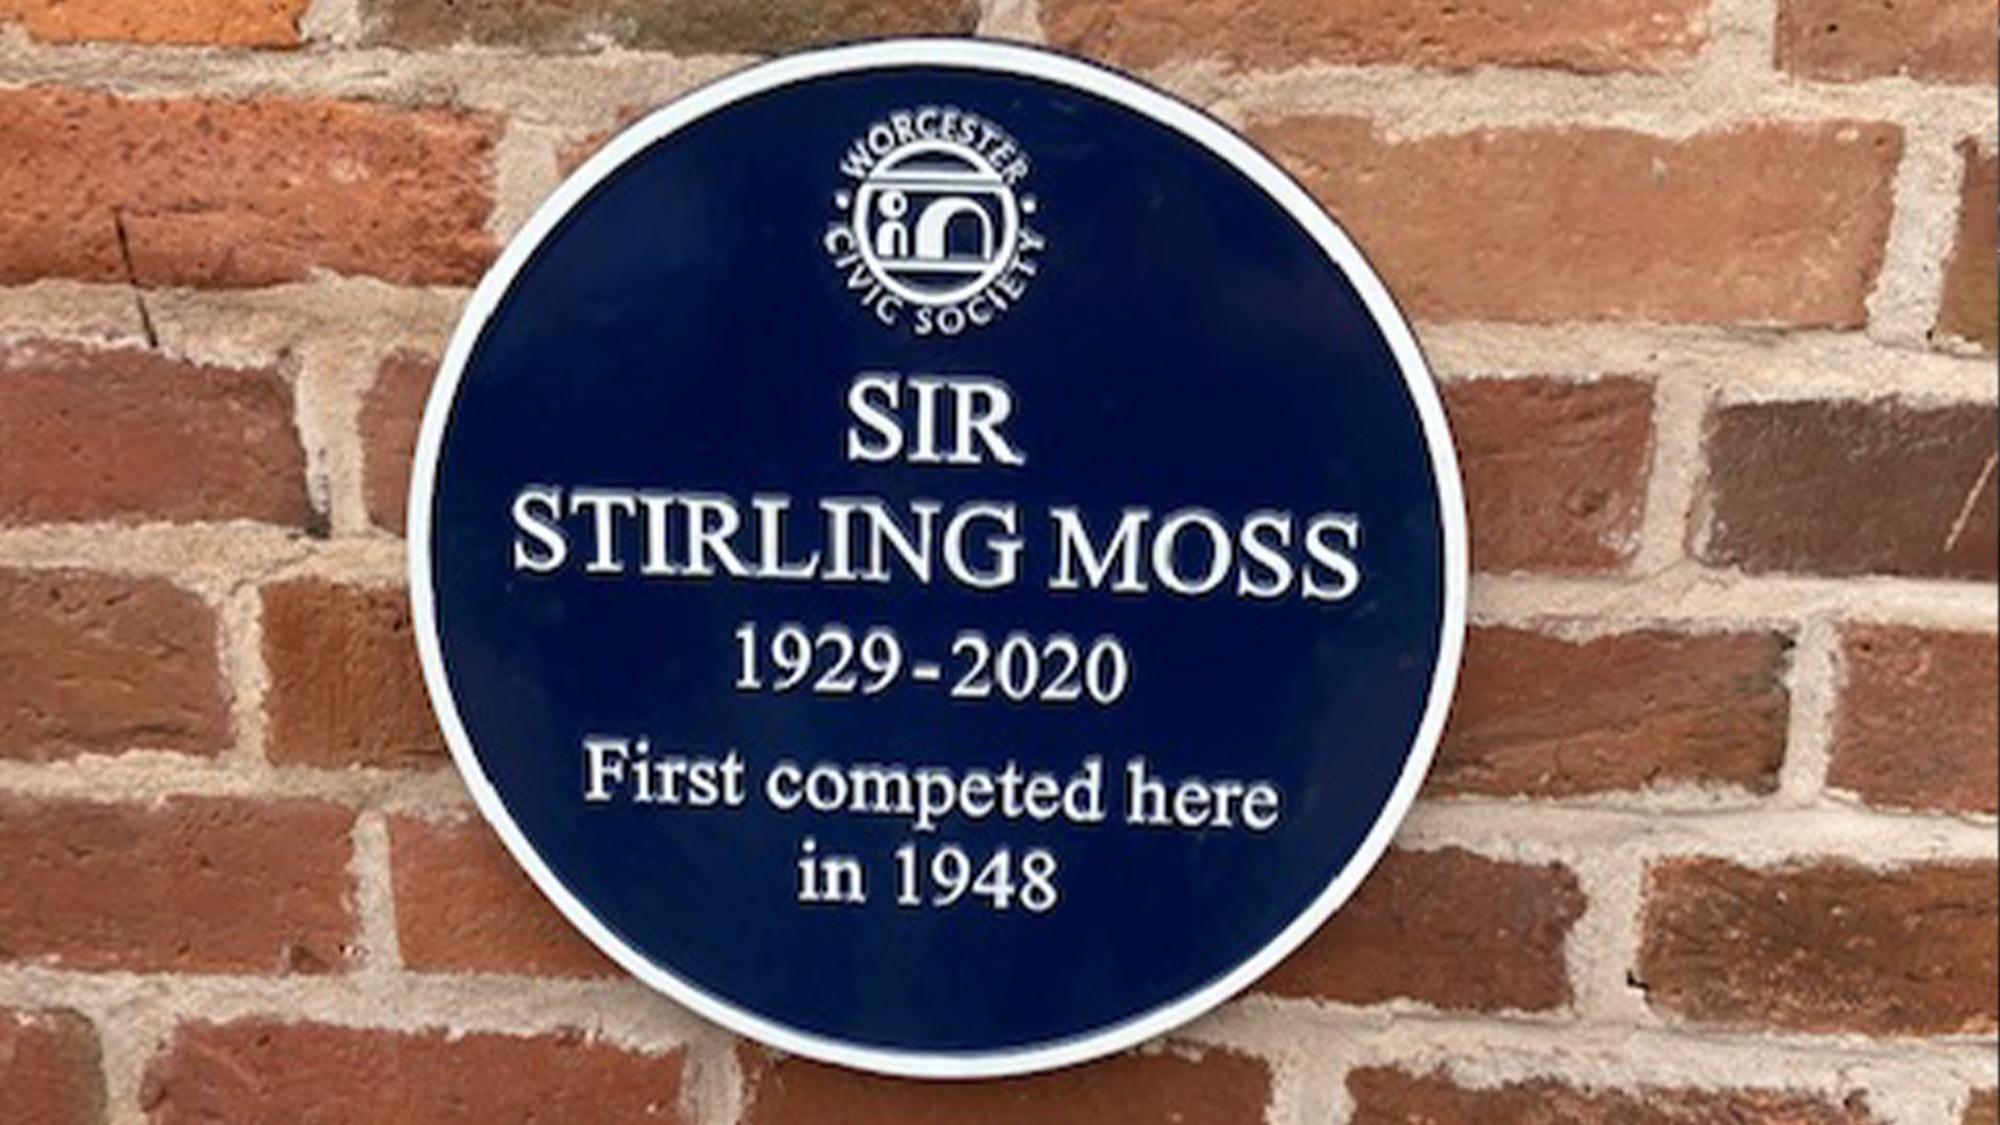 Stirling Moss blue plaque